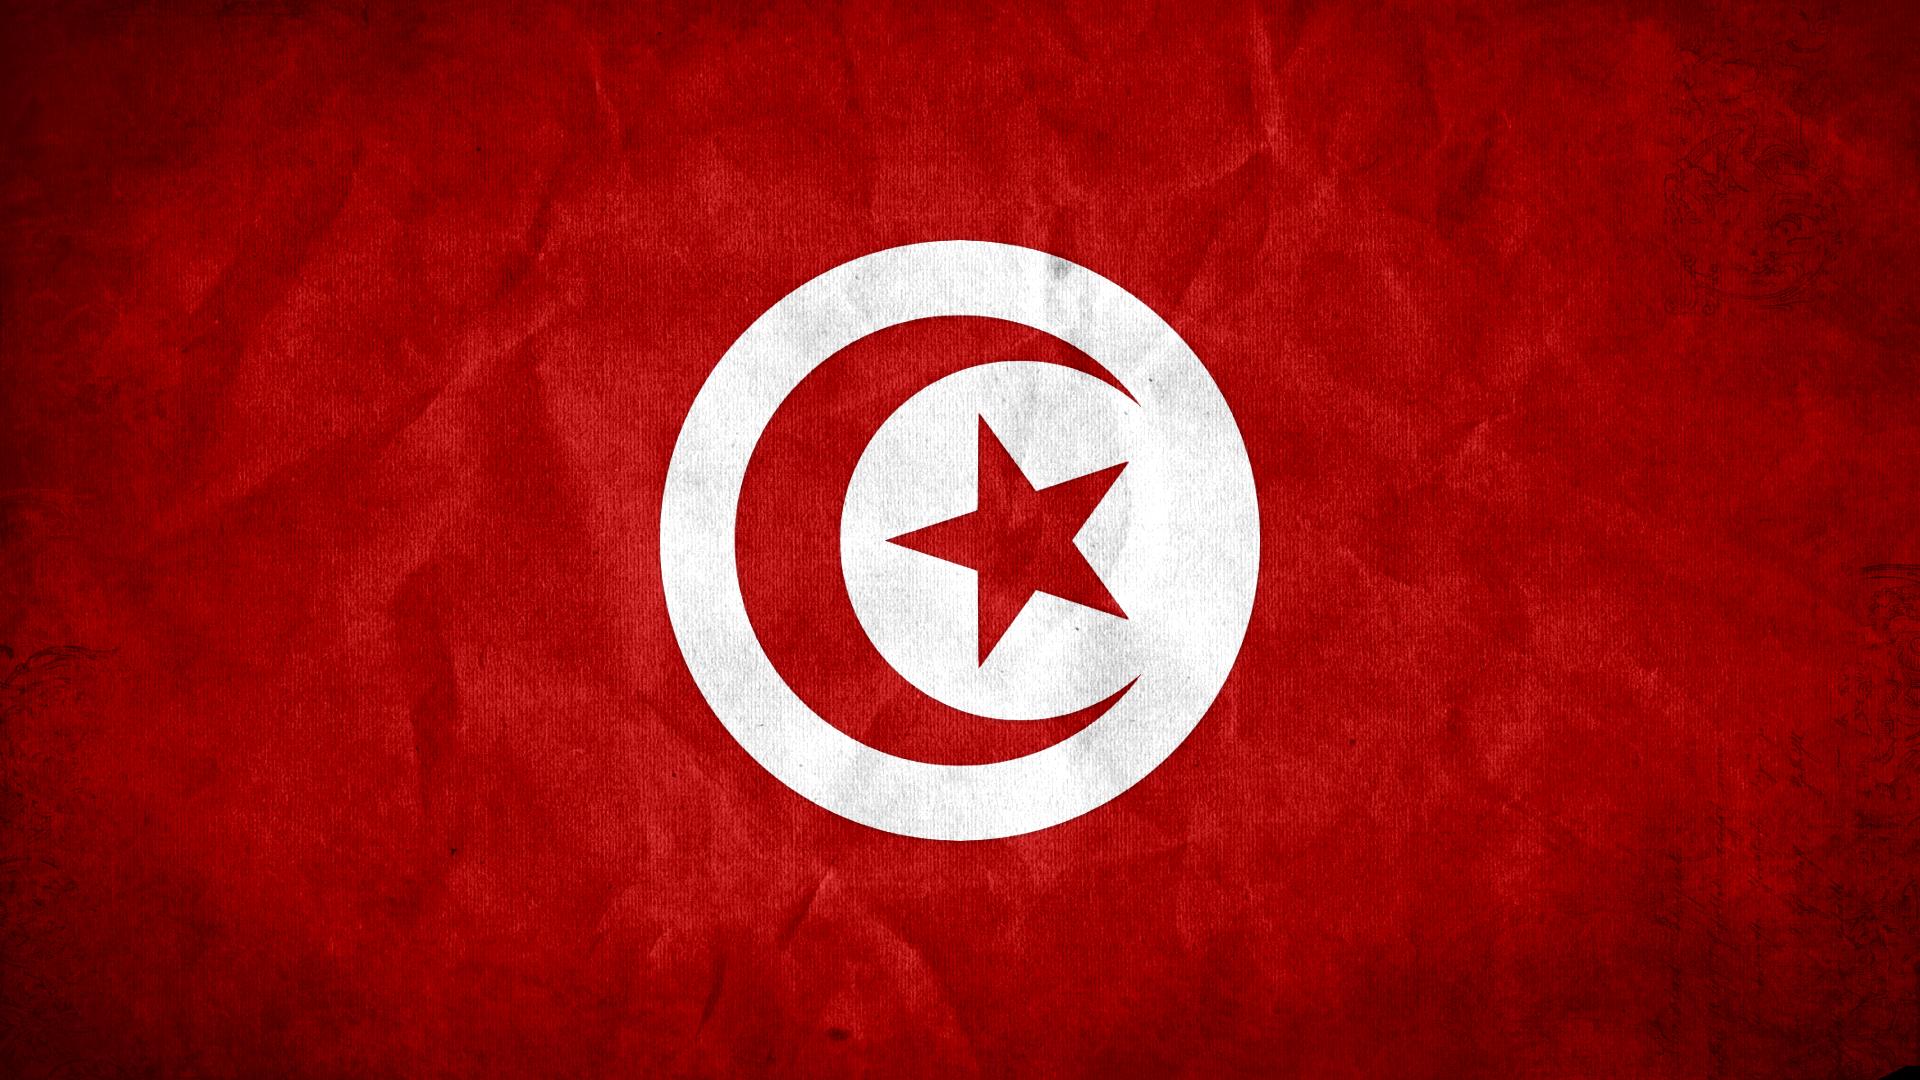 Tunisia Flag HD Wallpaper 1920x1080 ID25283   WallpaperVortexcom 1920x1080